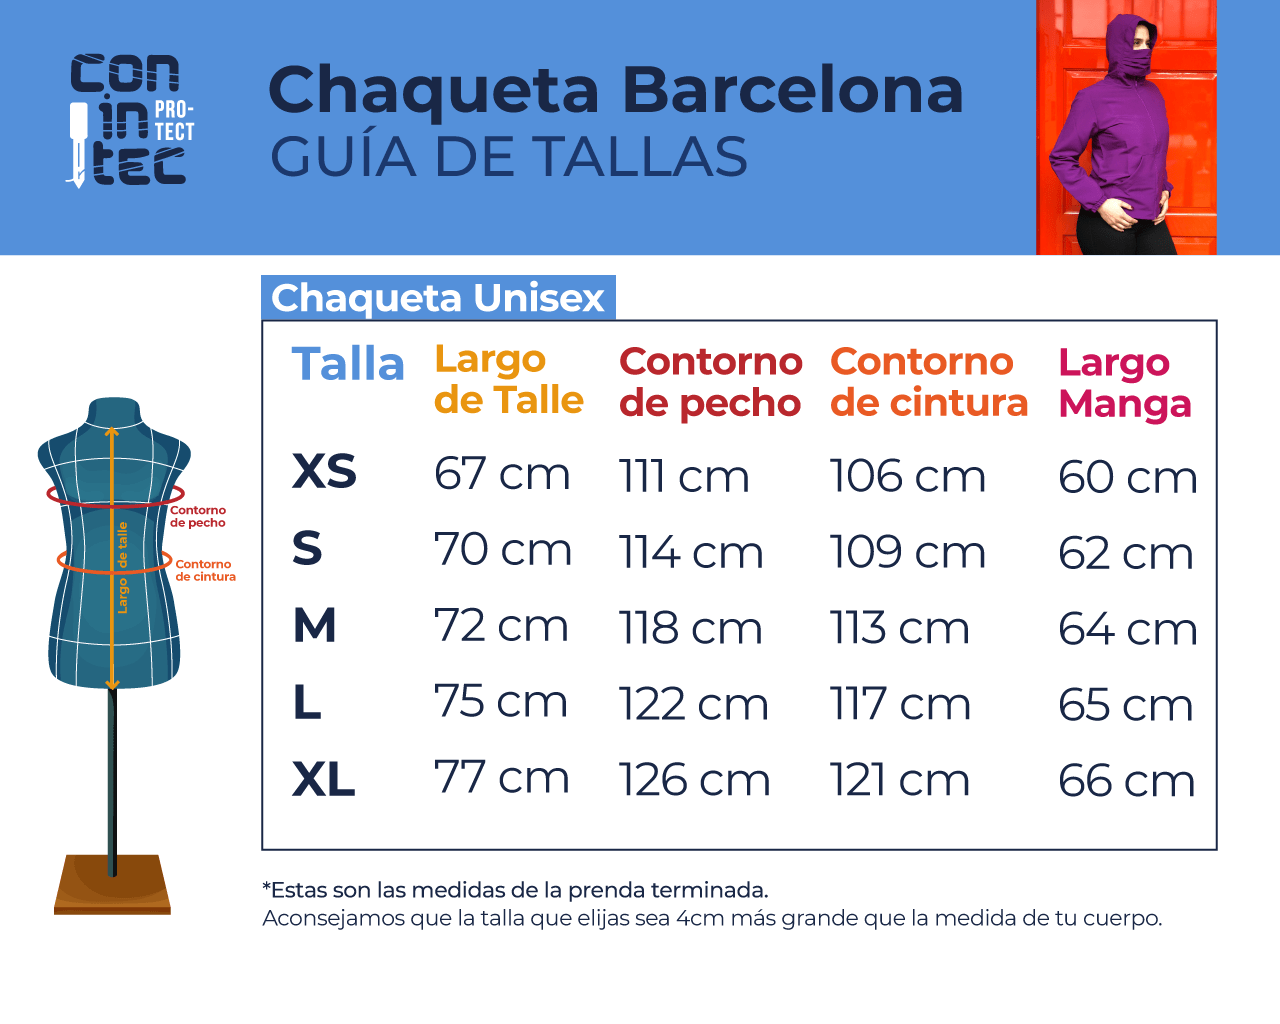 Guía de Tallas – Barcelona